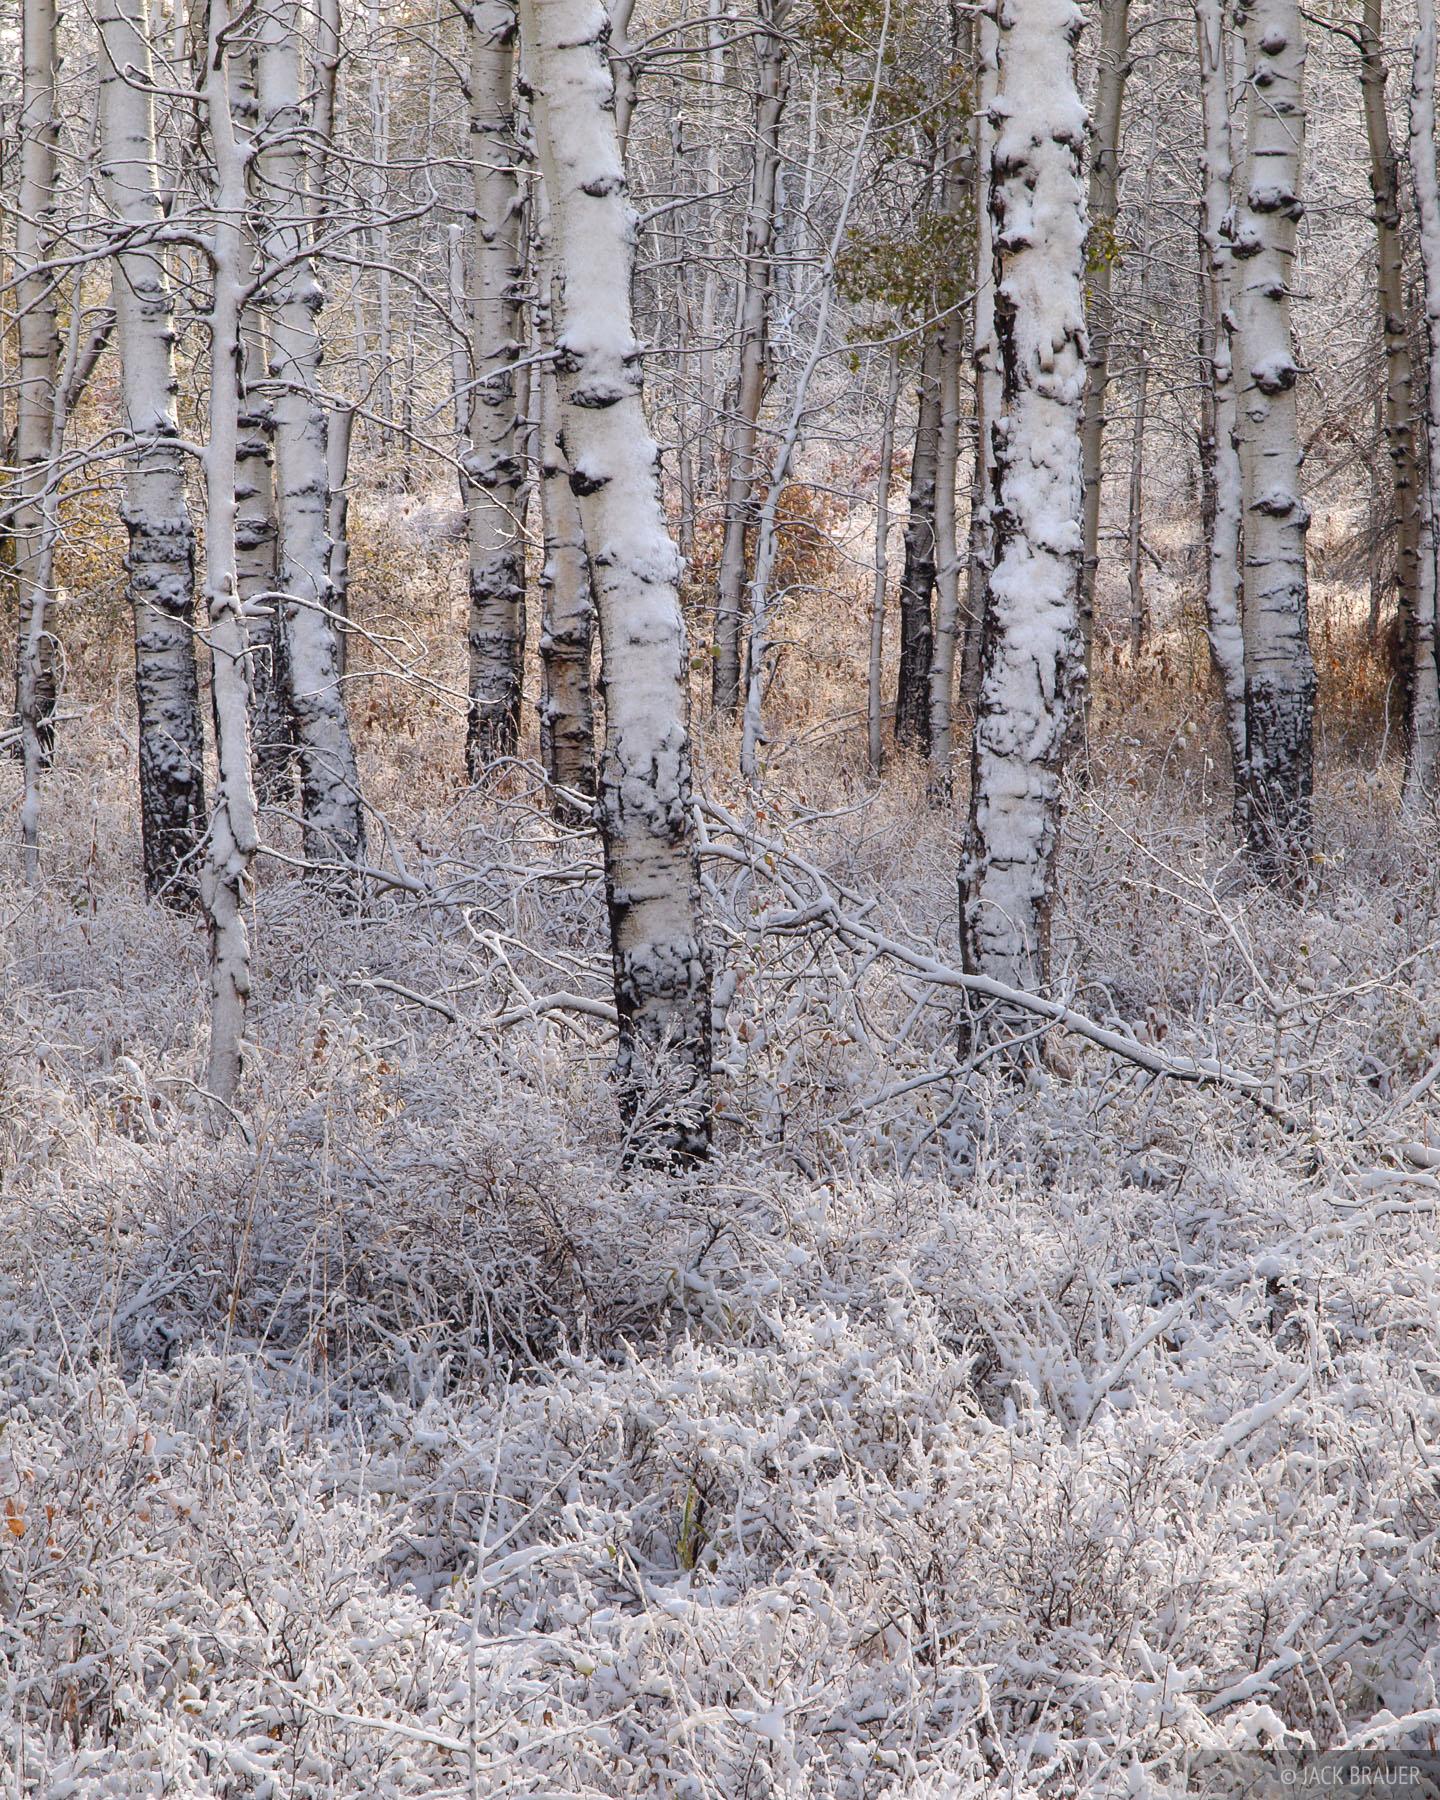 aspens, Wasatch Range, Utah, snow, october, photo